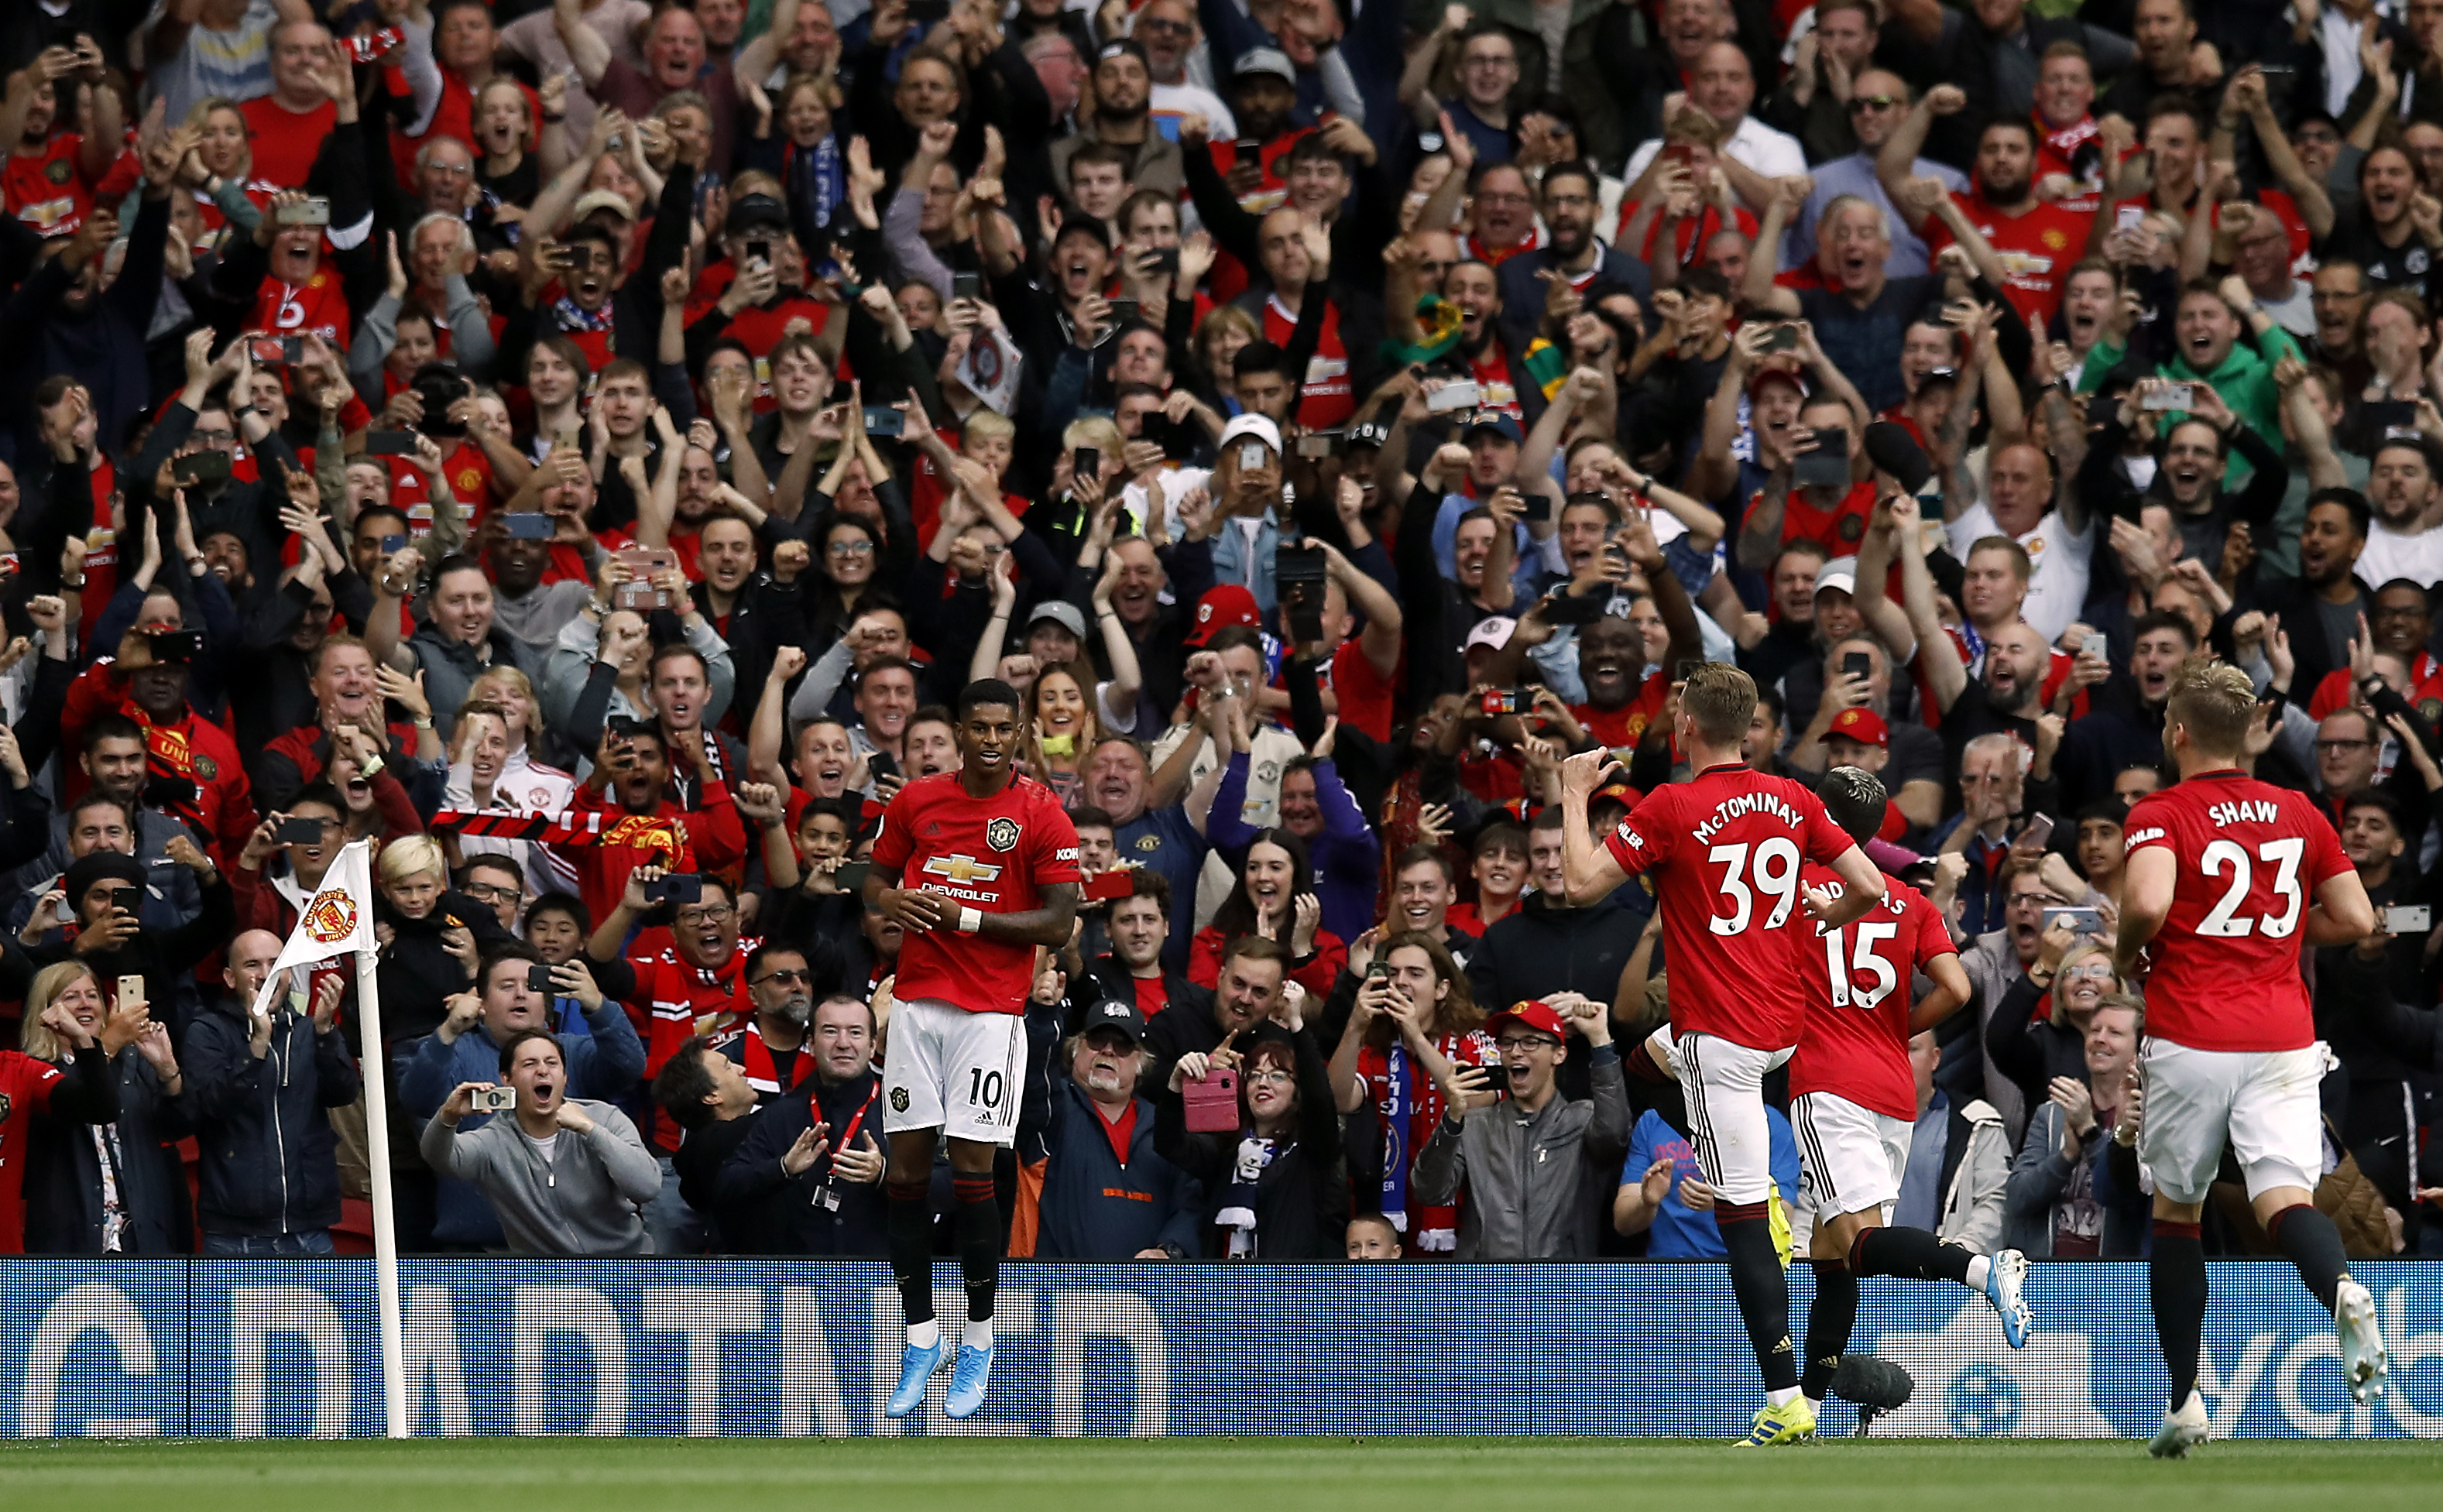 Marcus Rashford scored twice in a 4-0 drubbing of Chelsea at Old Trafford